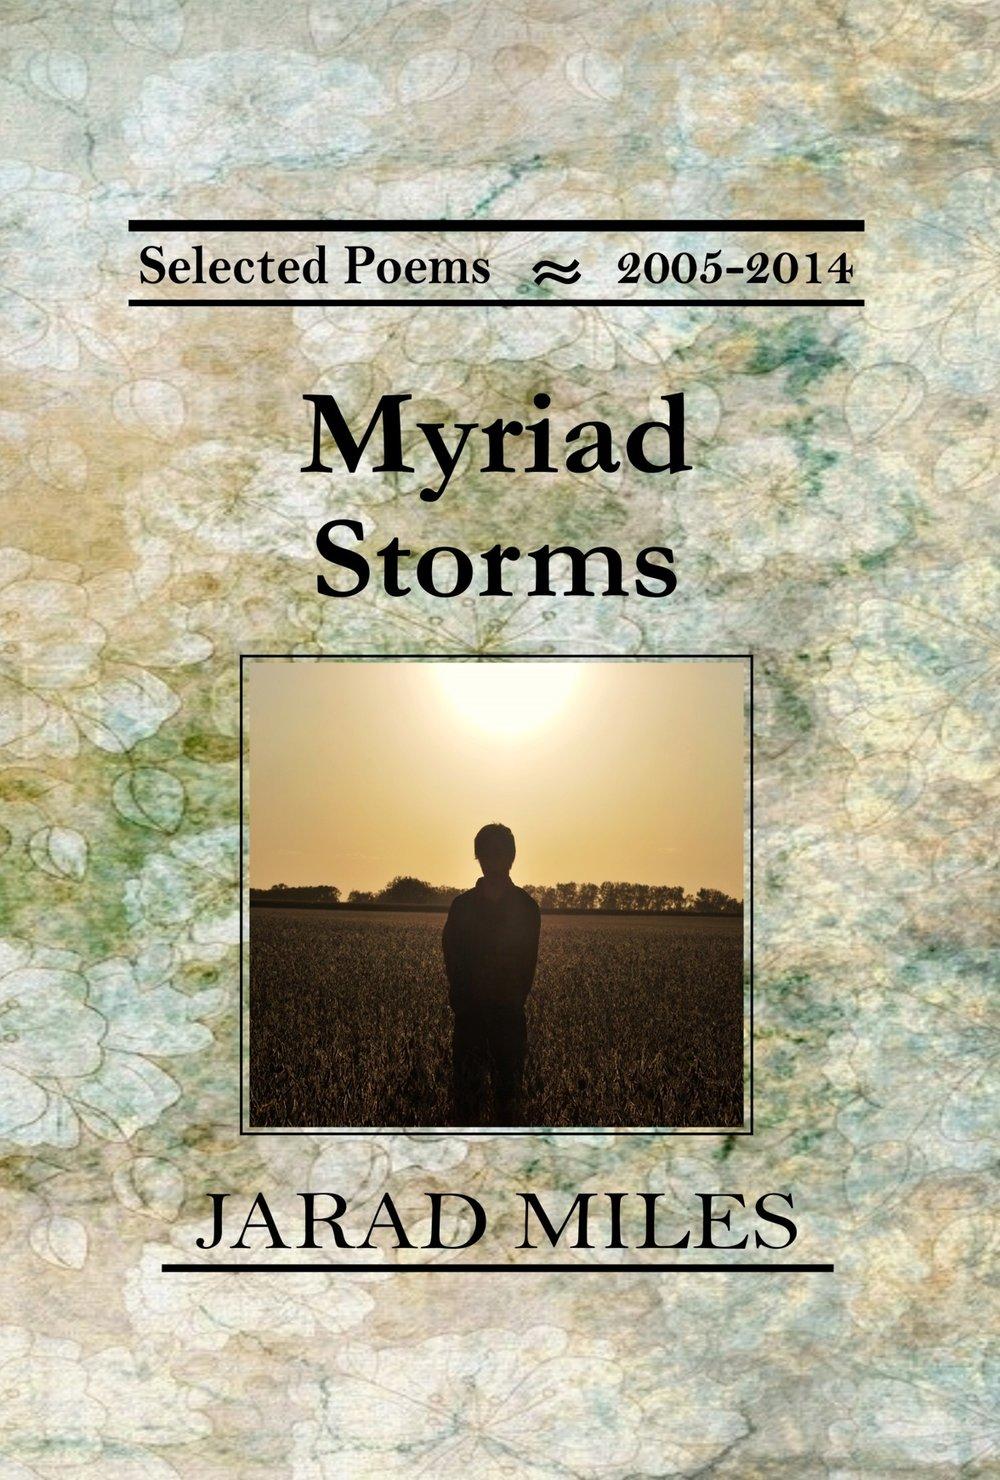 Jarad-Miles-Myriad-Storms-cover-12-31-18.jpg